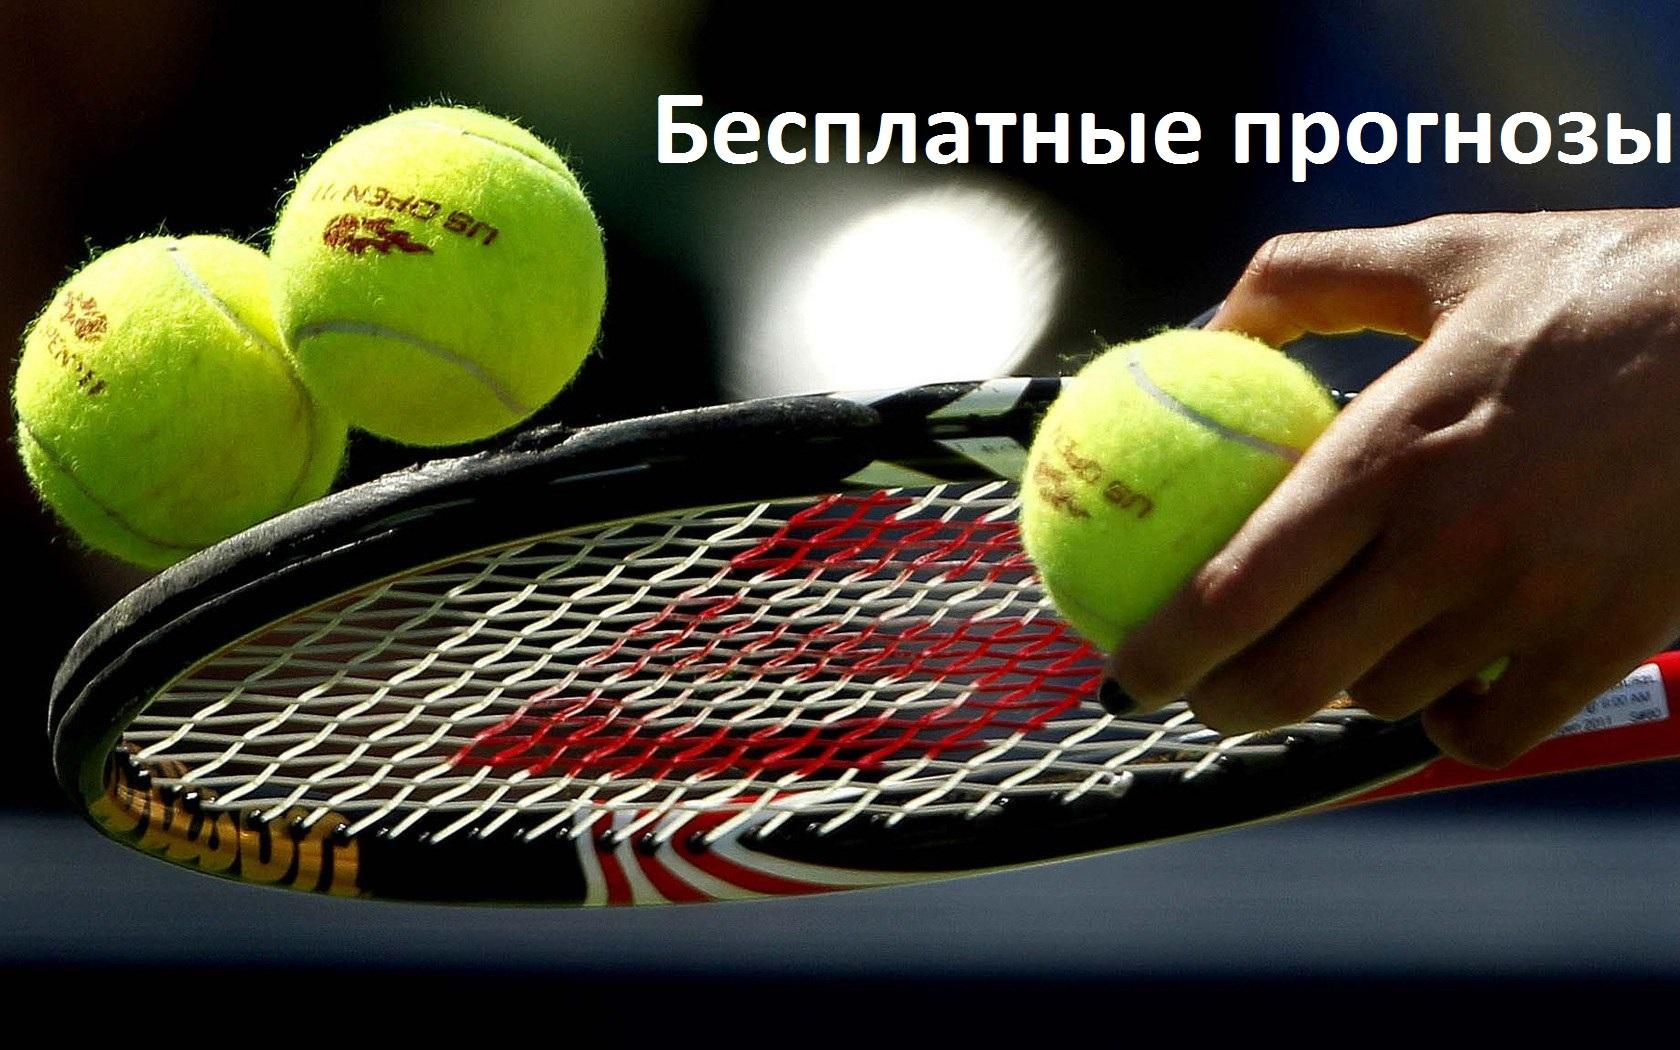 Прогнозы на спорт tenis прогноз на сегодня по спорту